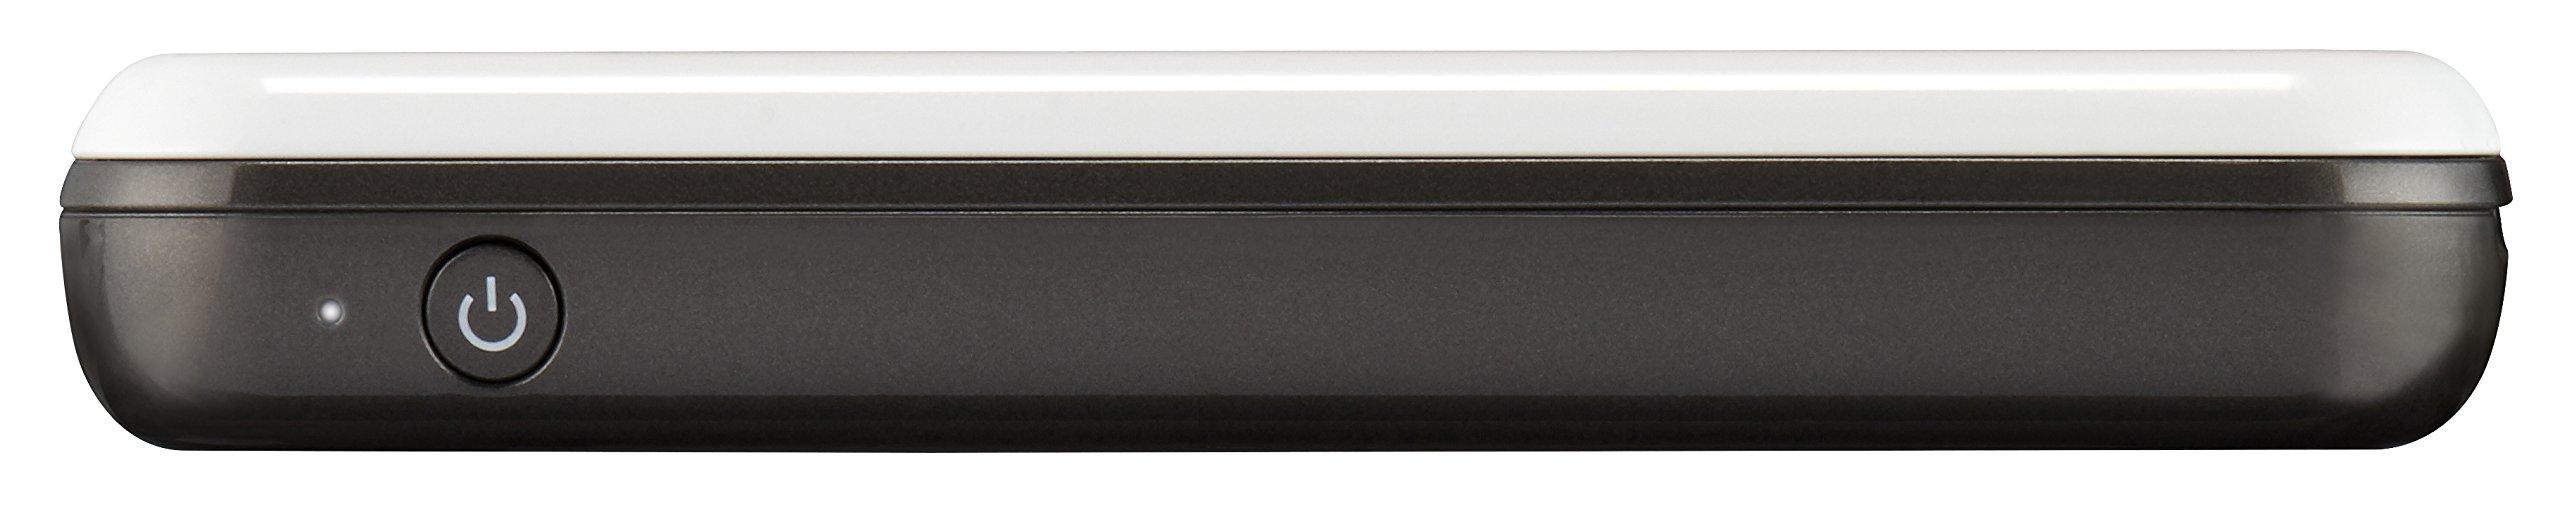 Canon IVY Mobile Mini Photo Printer through Bluetooth(R), Slate Gray by Canon (Image #3)